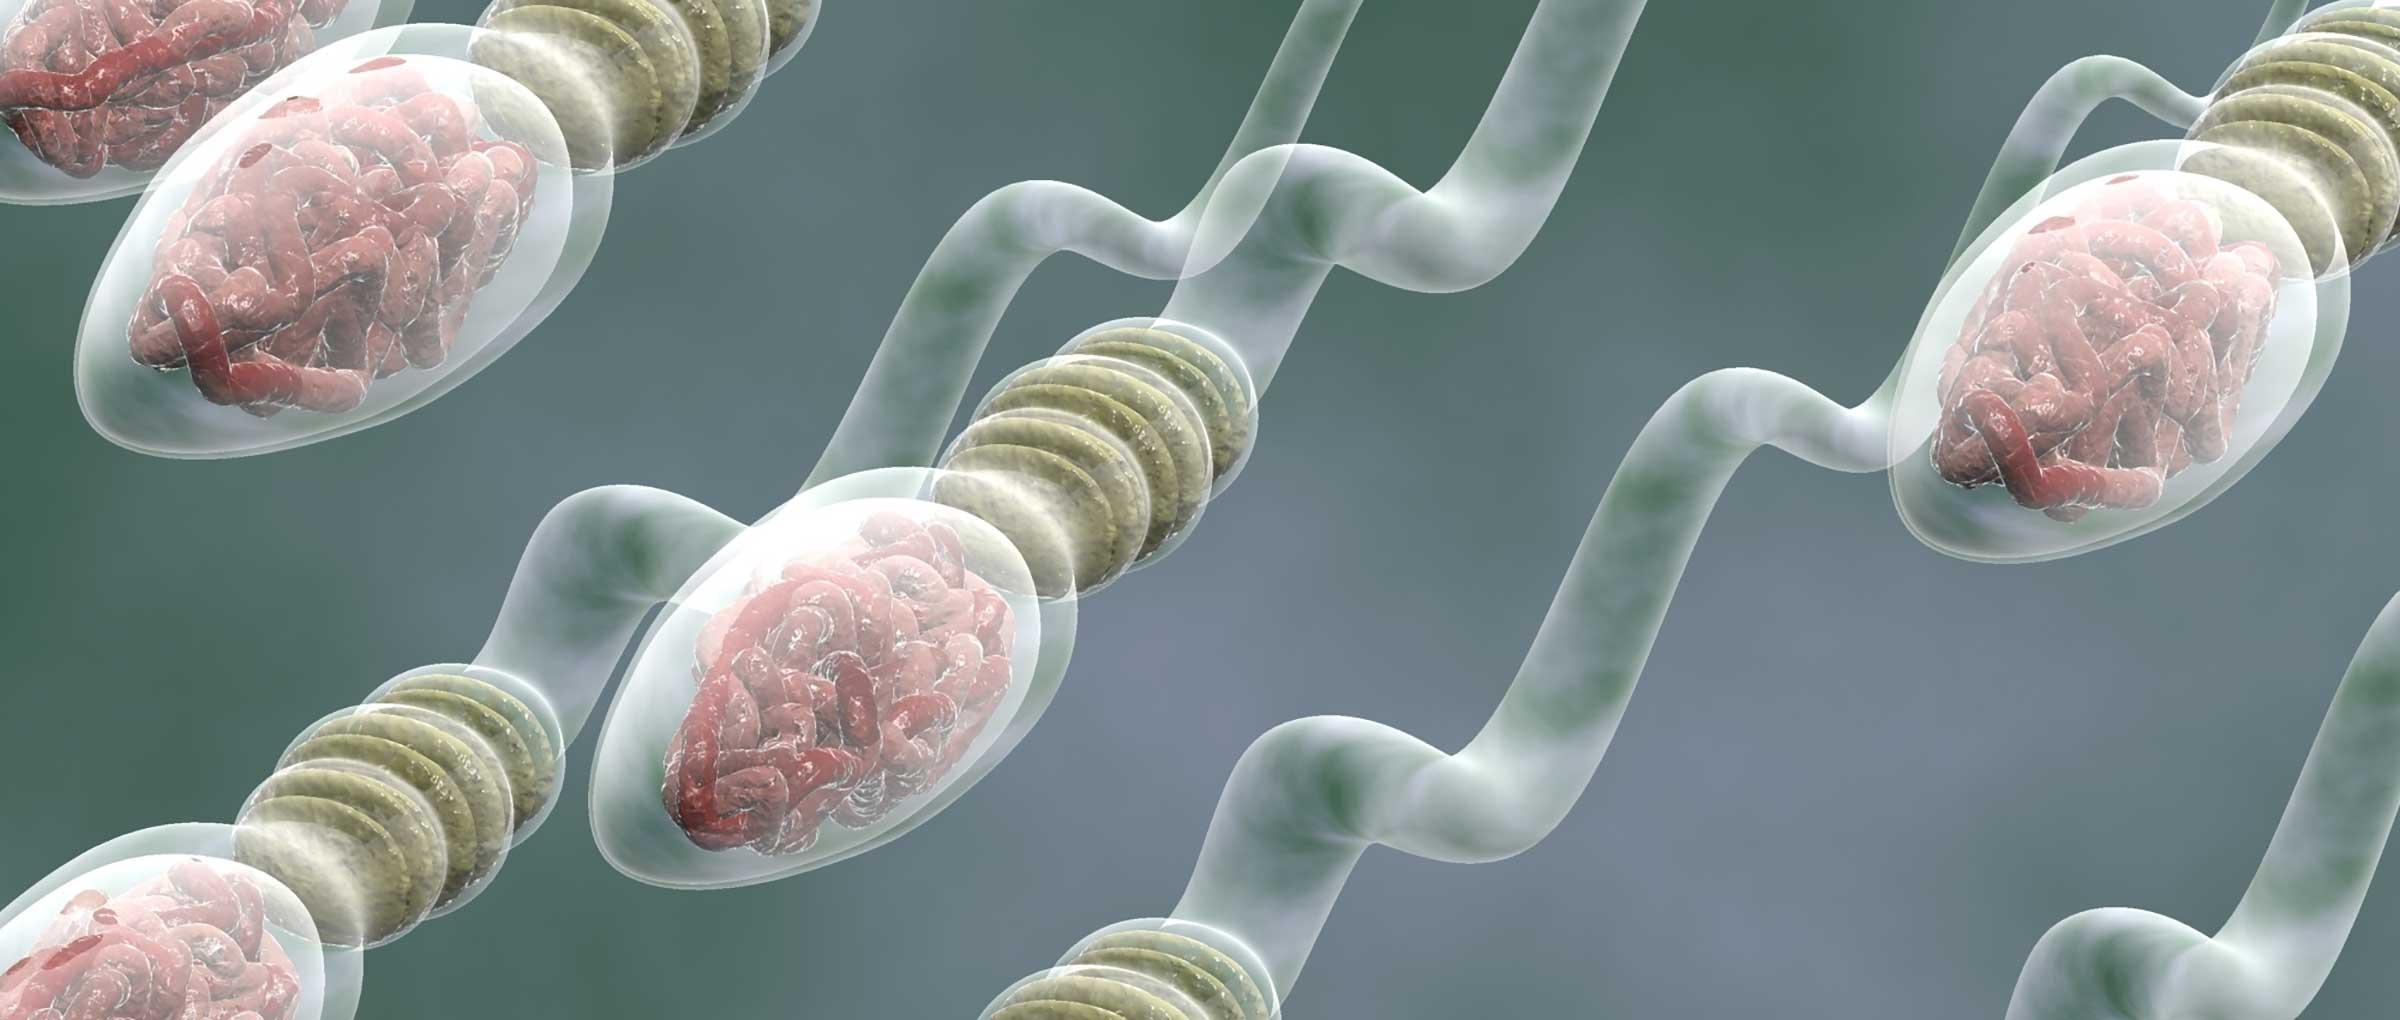 Sperm production process or spermatogenesis